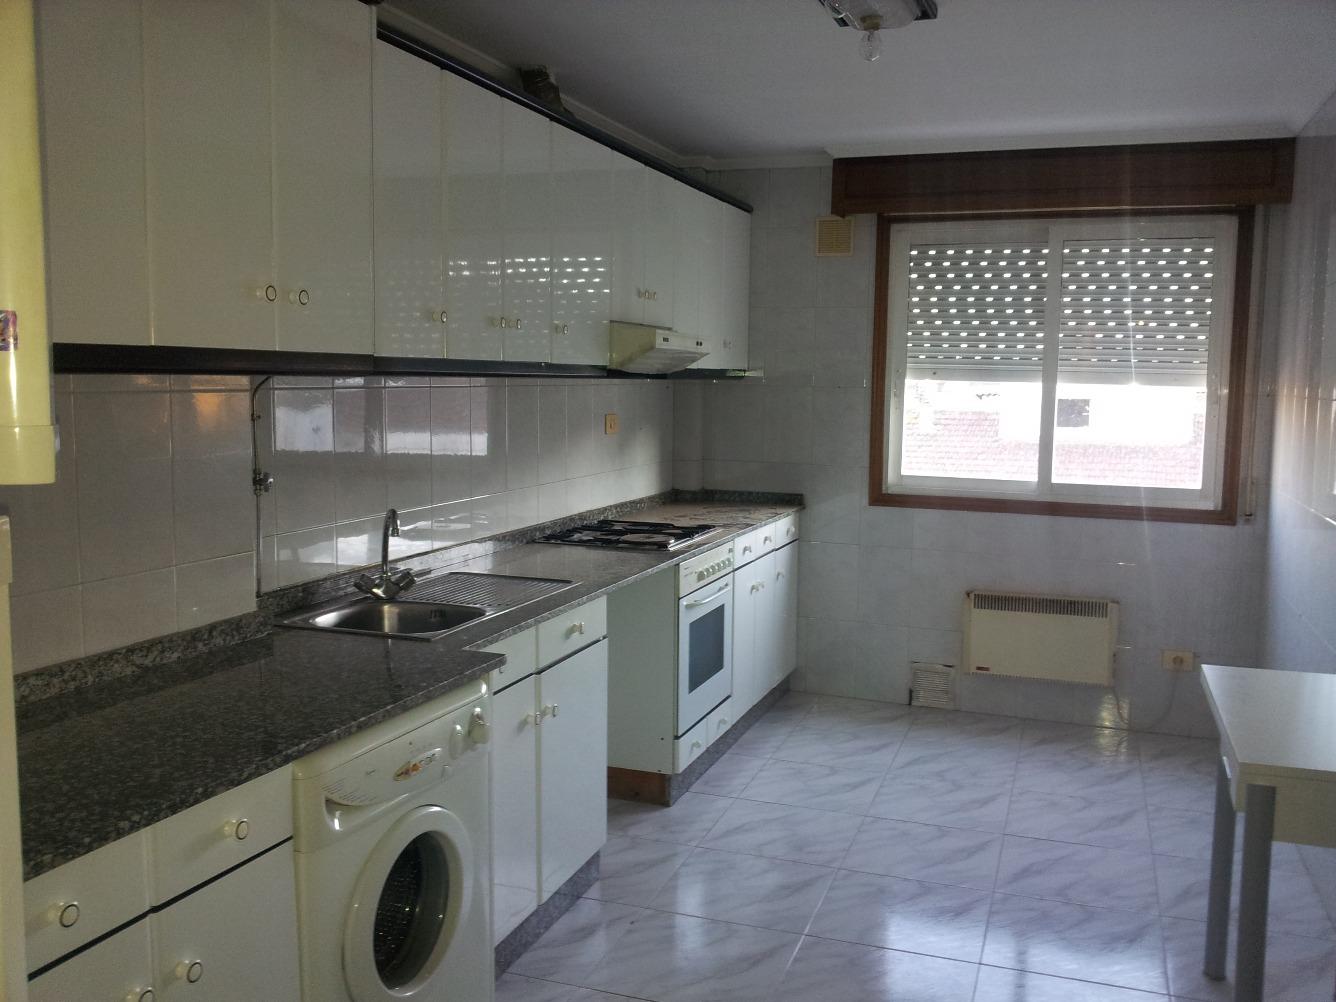 Inmobiliaria tren de segunda mano en ourense for Alquiler pisos zaragoza particulares sin muebles